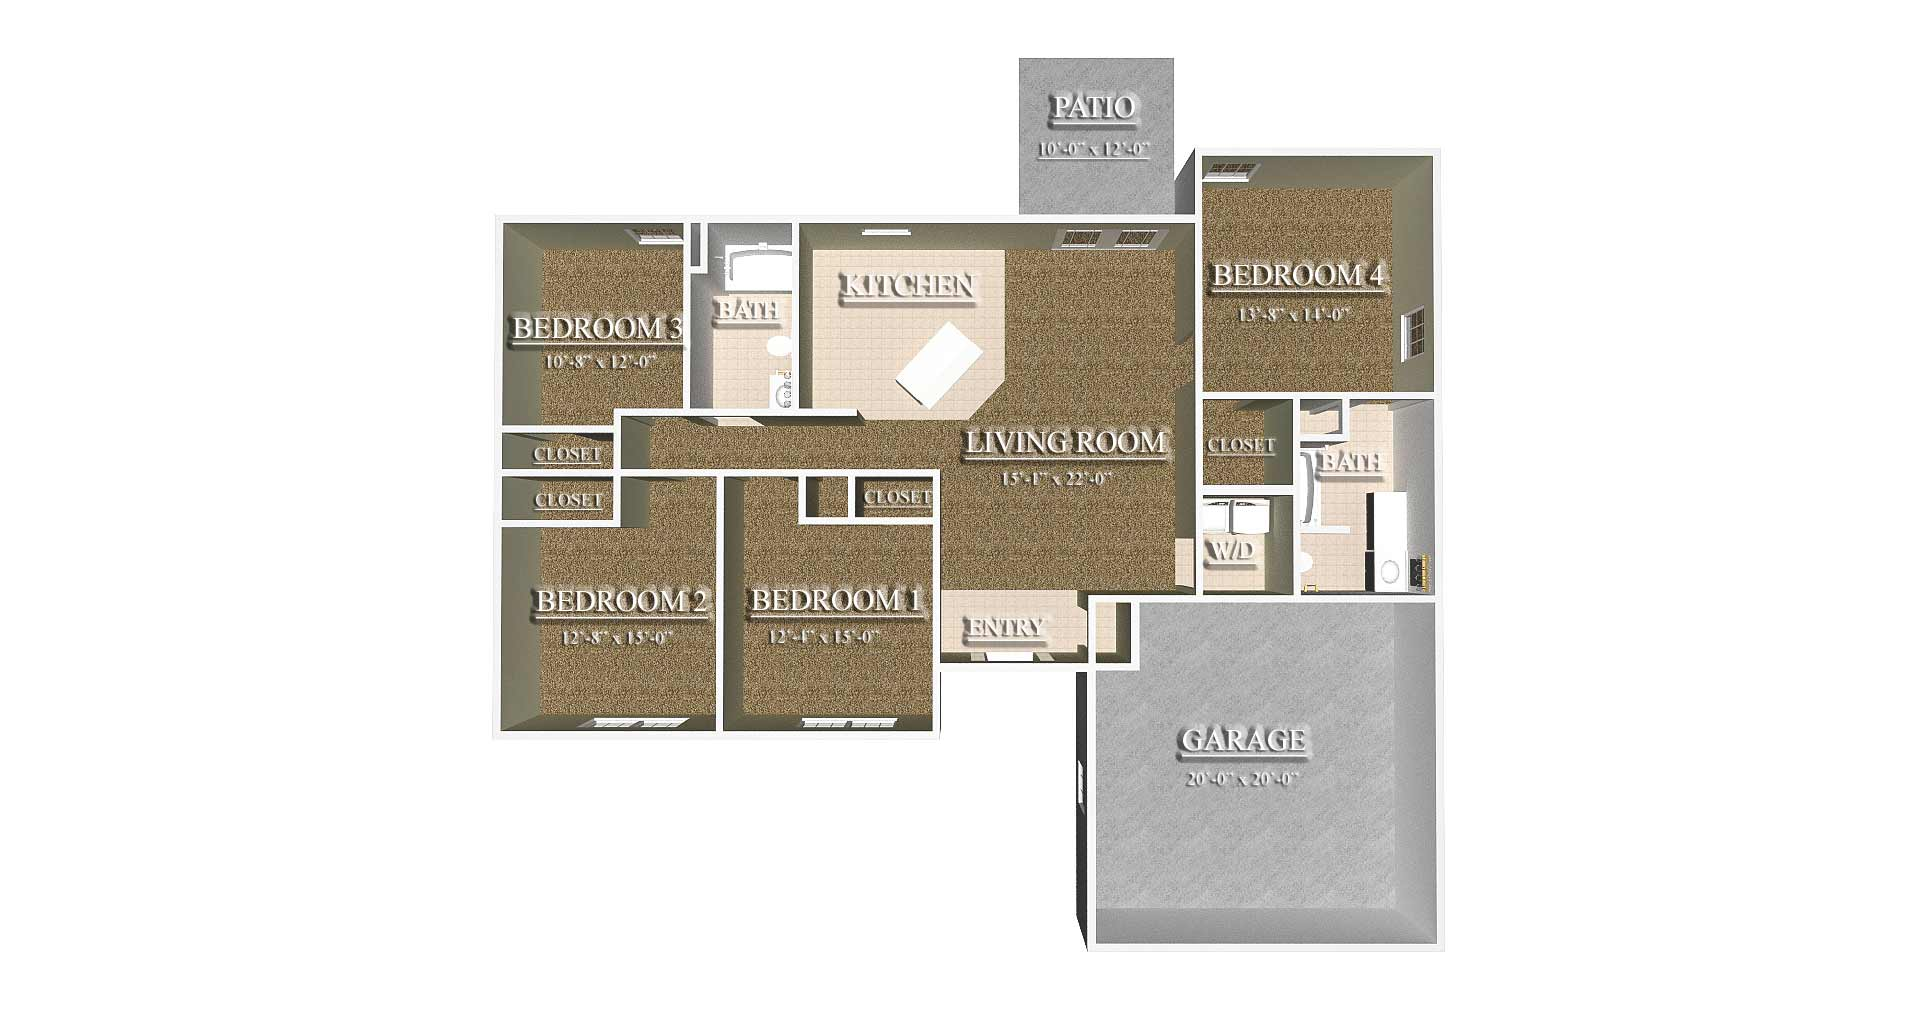 Floorplan 1  4 Bedroom. Ridge Estates at Hammond Home property management  Ridge Estates